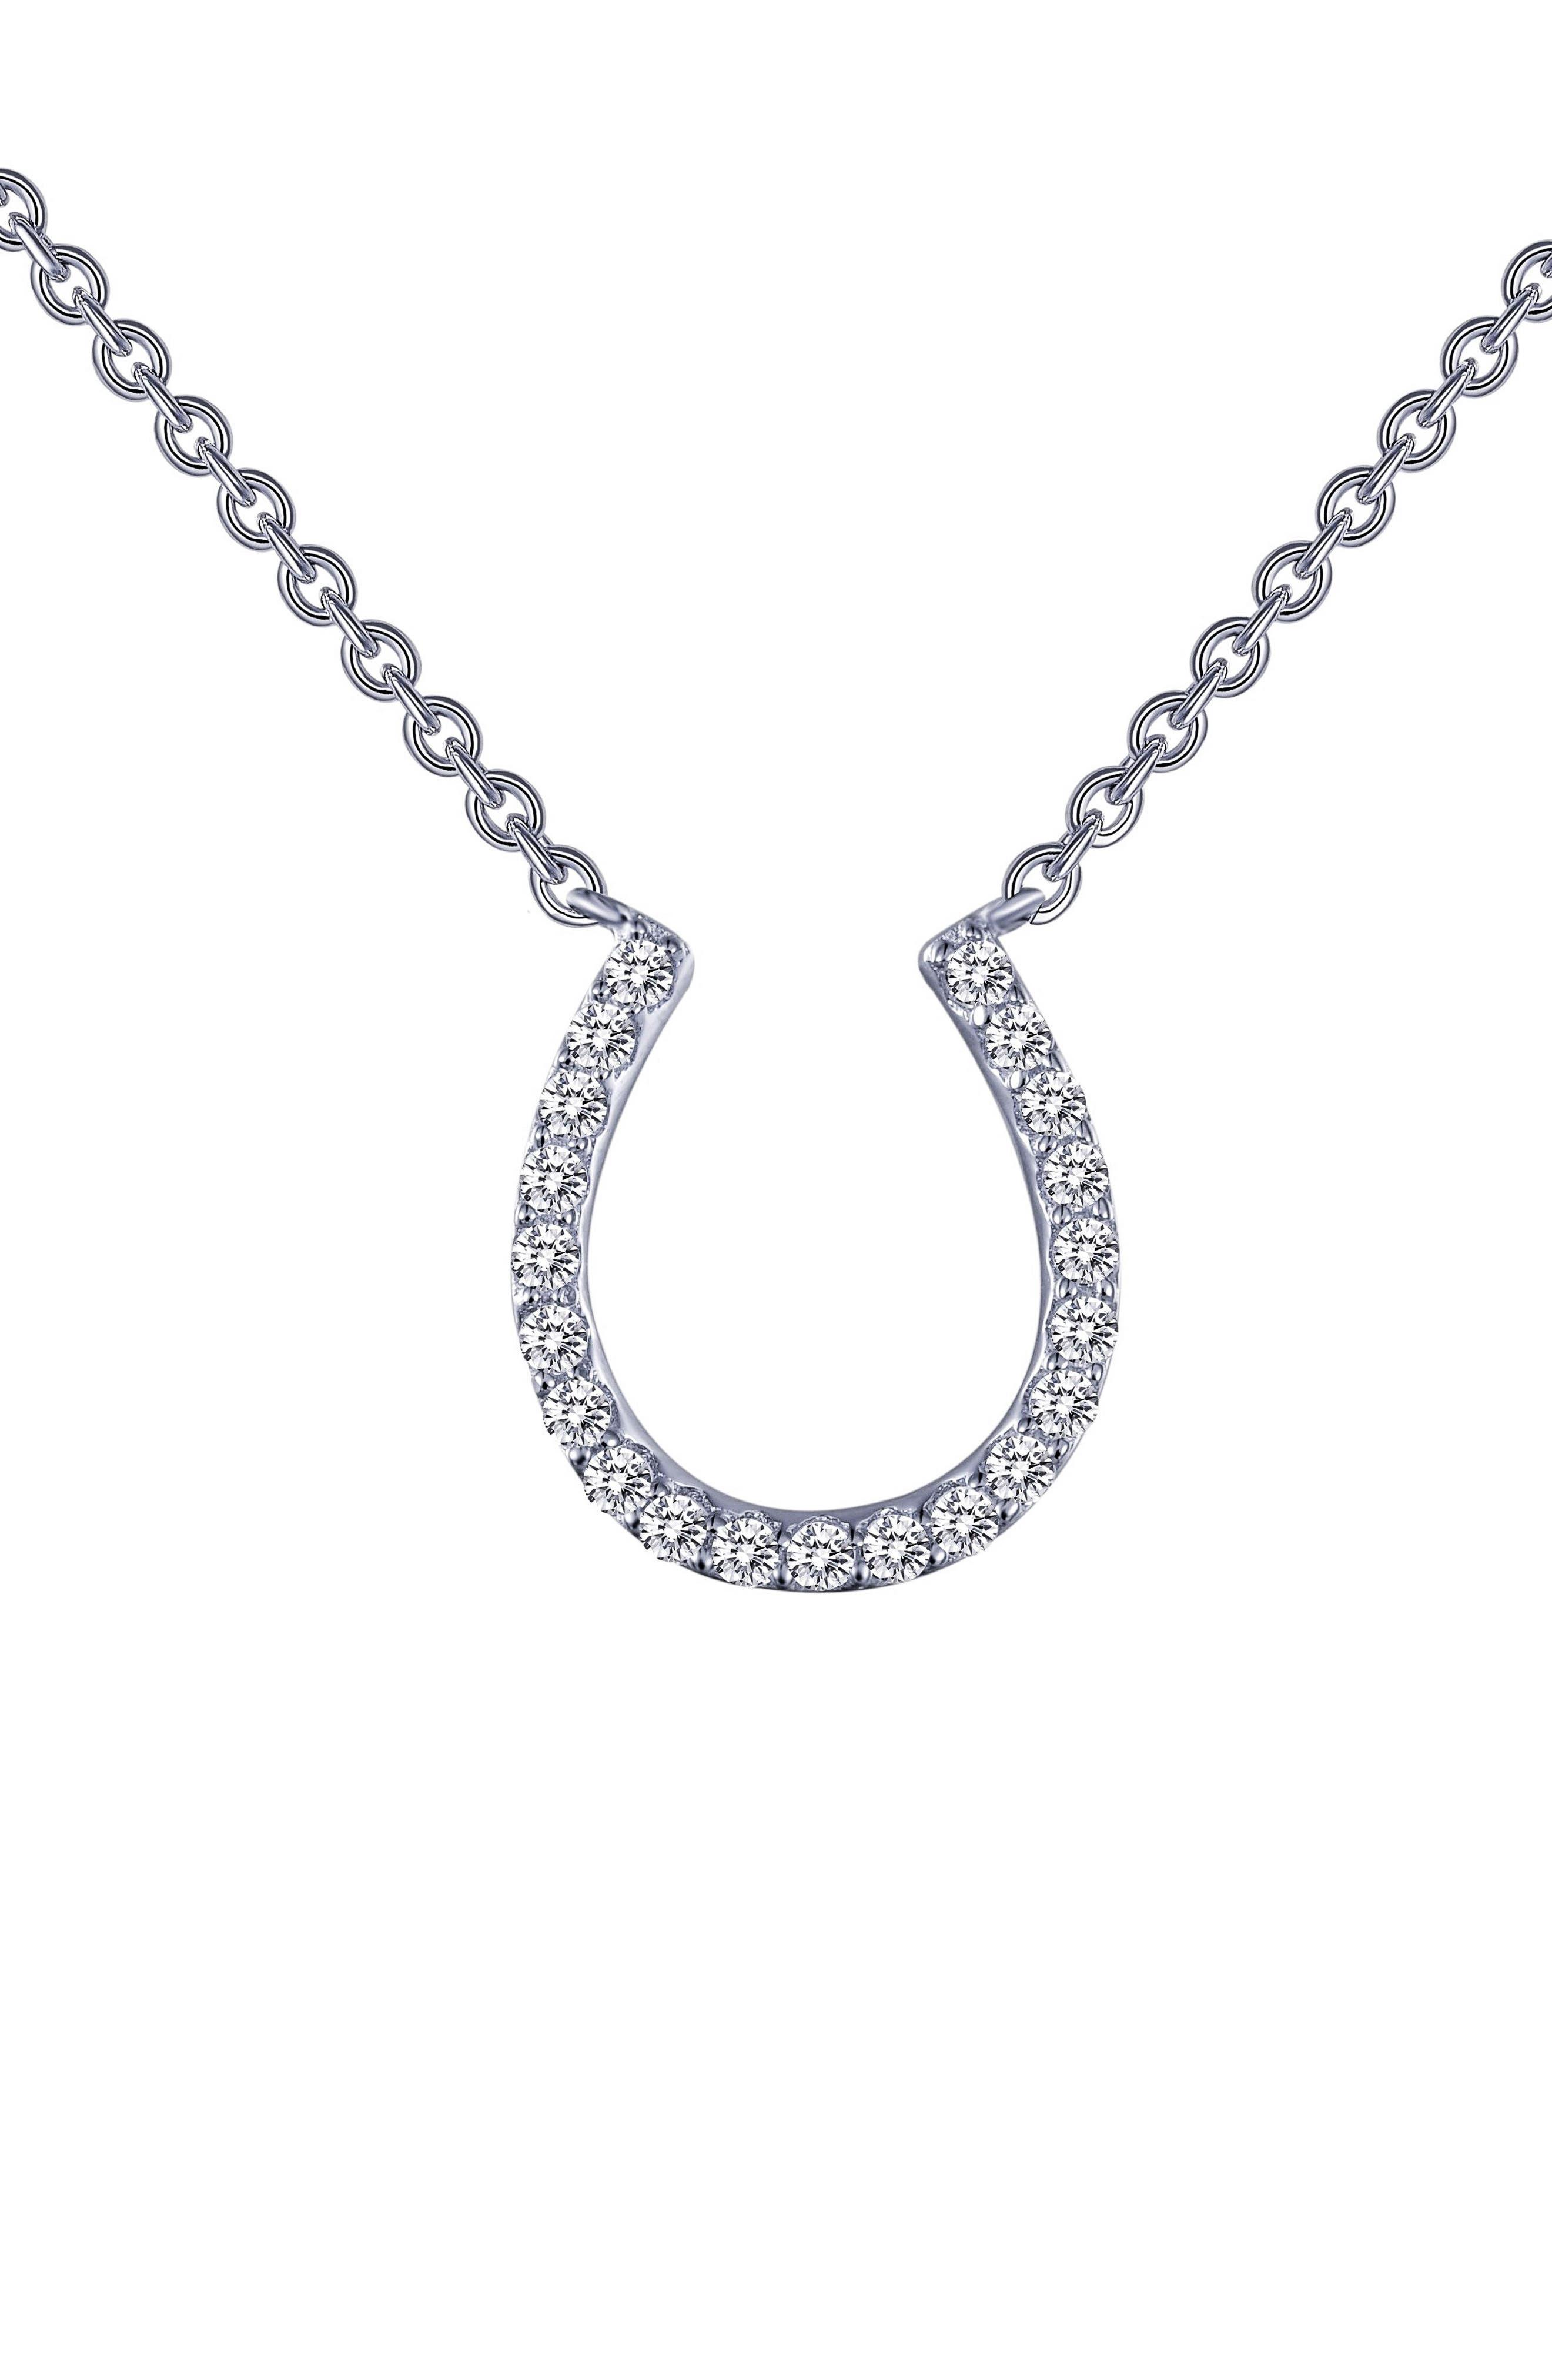 Horseshoe Simulated Diamond Pendant Necklace,                         Main,                         color, 040